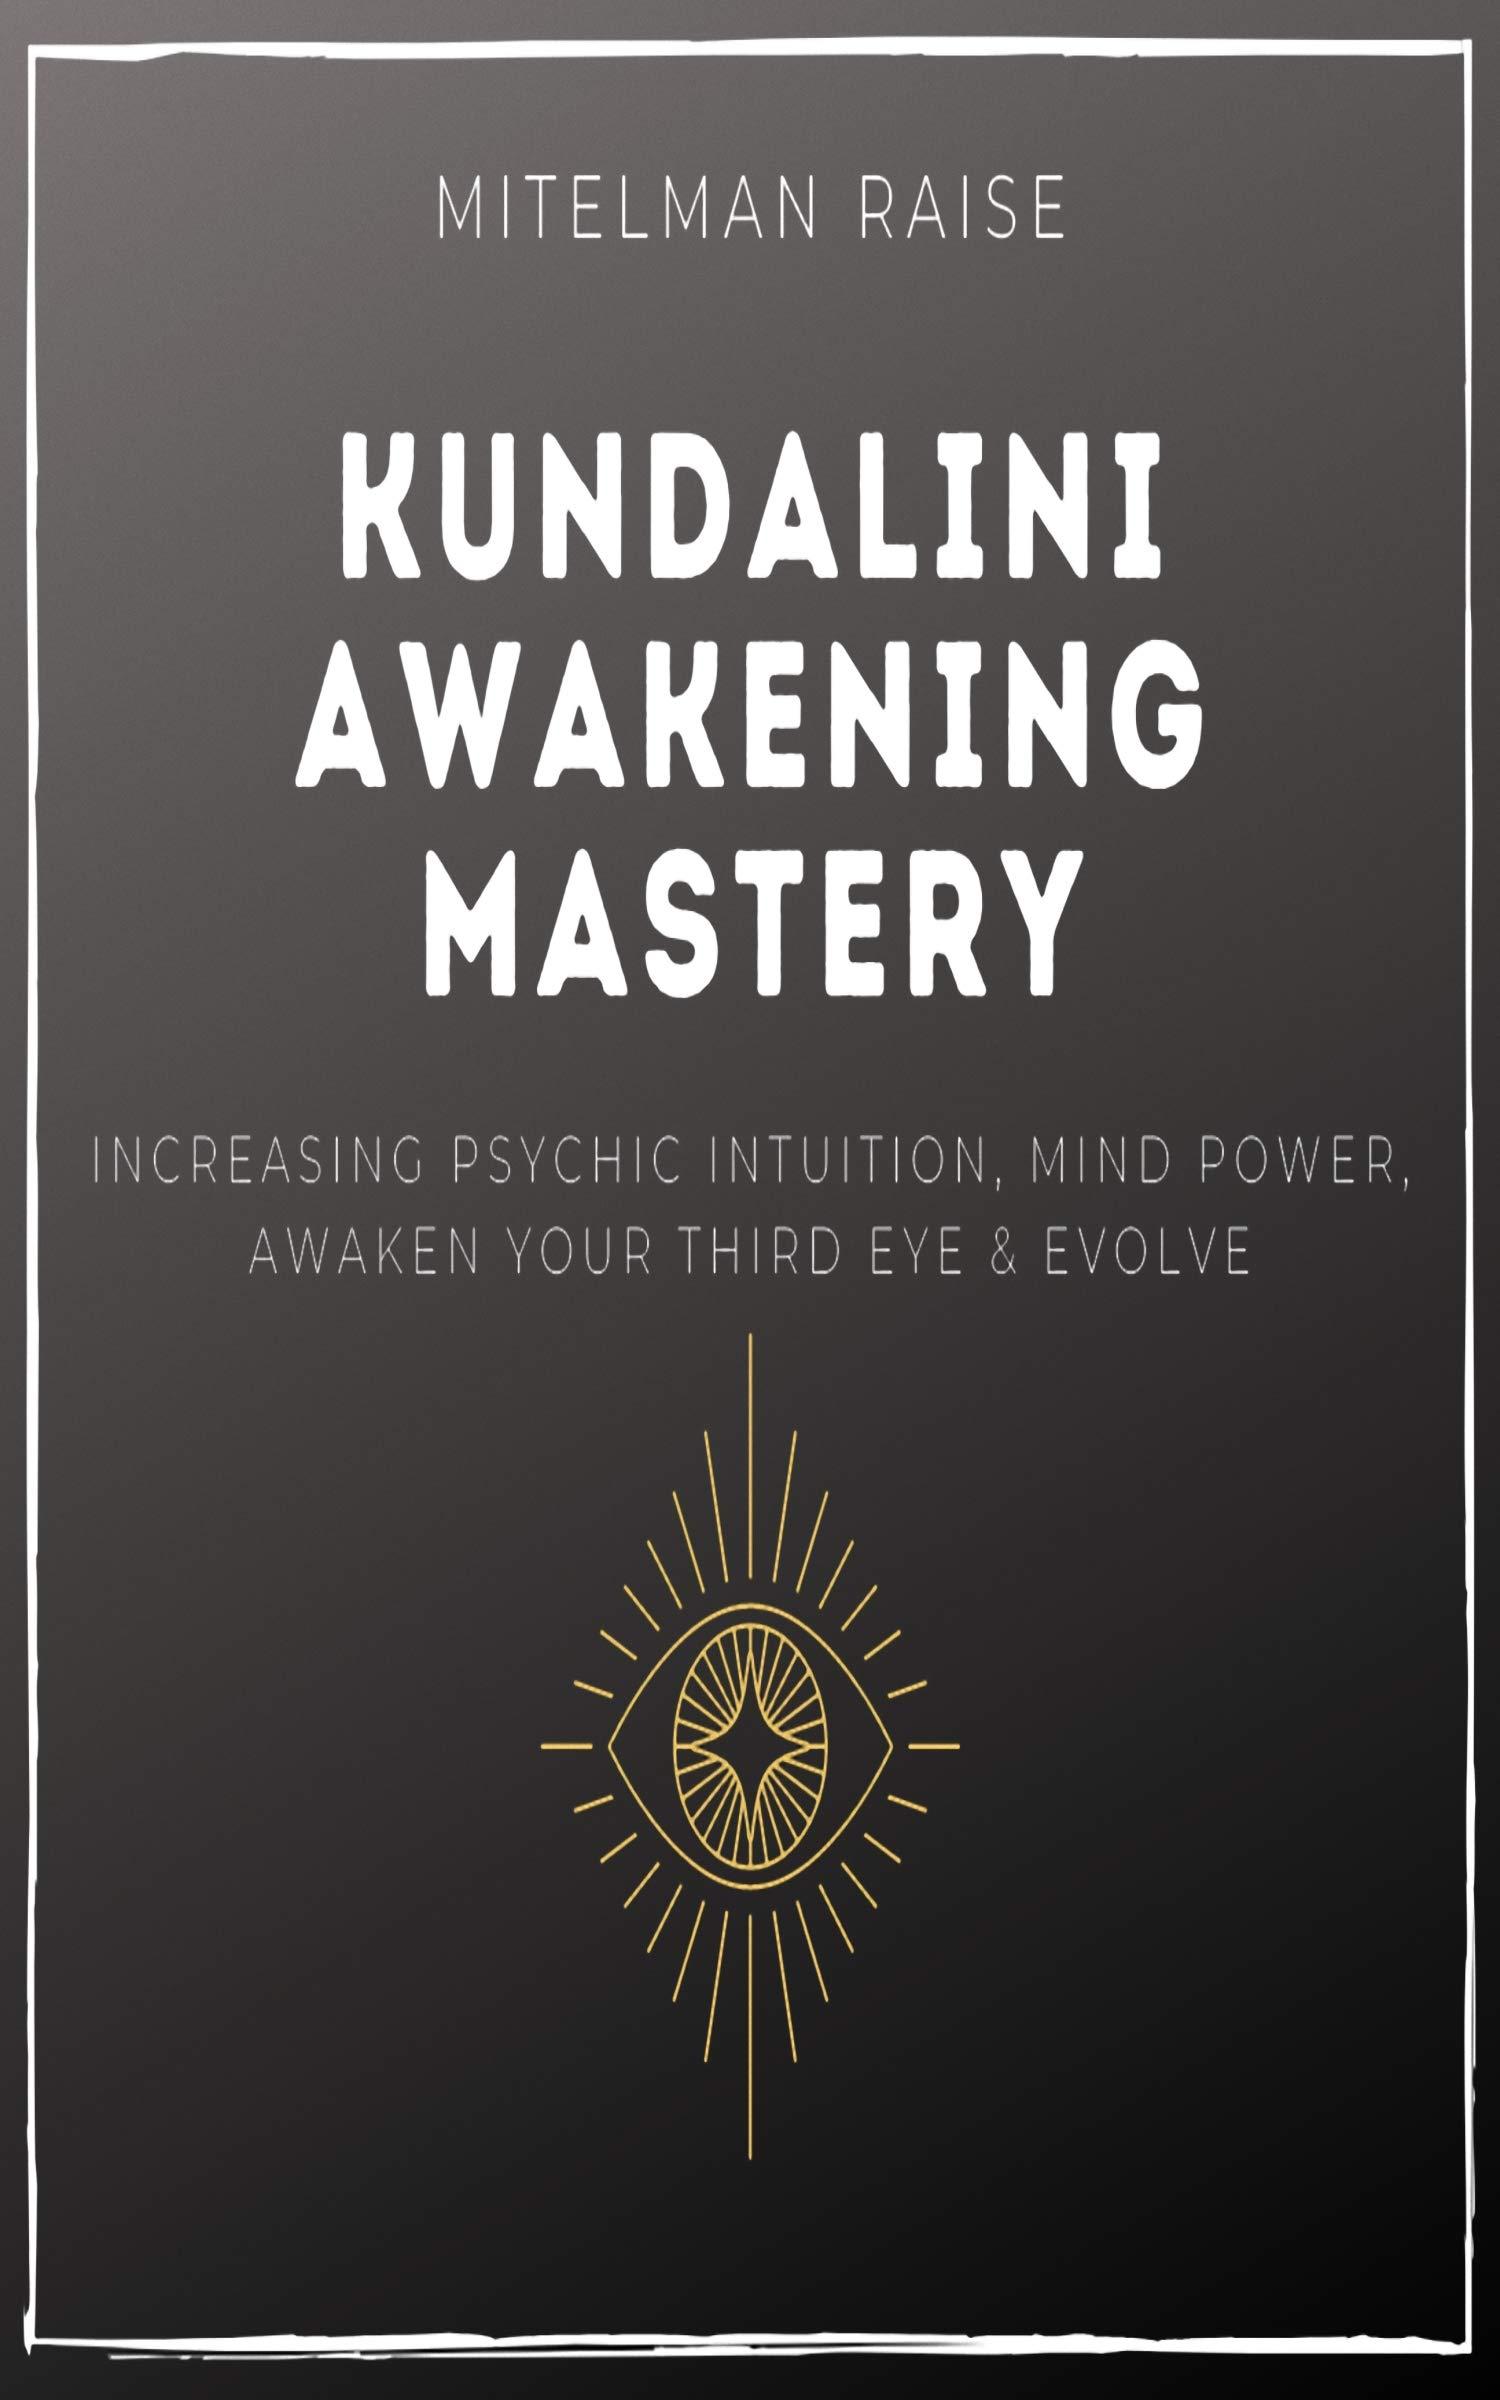 Kundalini Awakening Mastery: Increase Psychic Intuition, Mind Power, Awaken Your Third Eye & Evolve